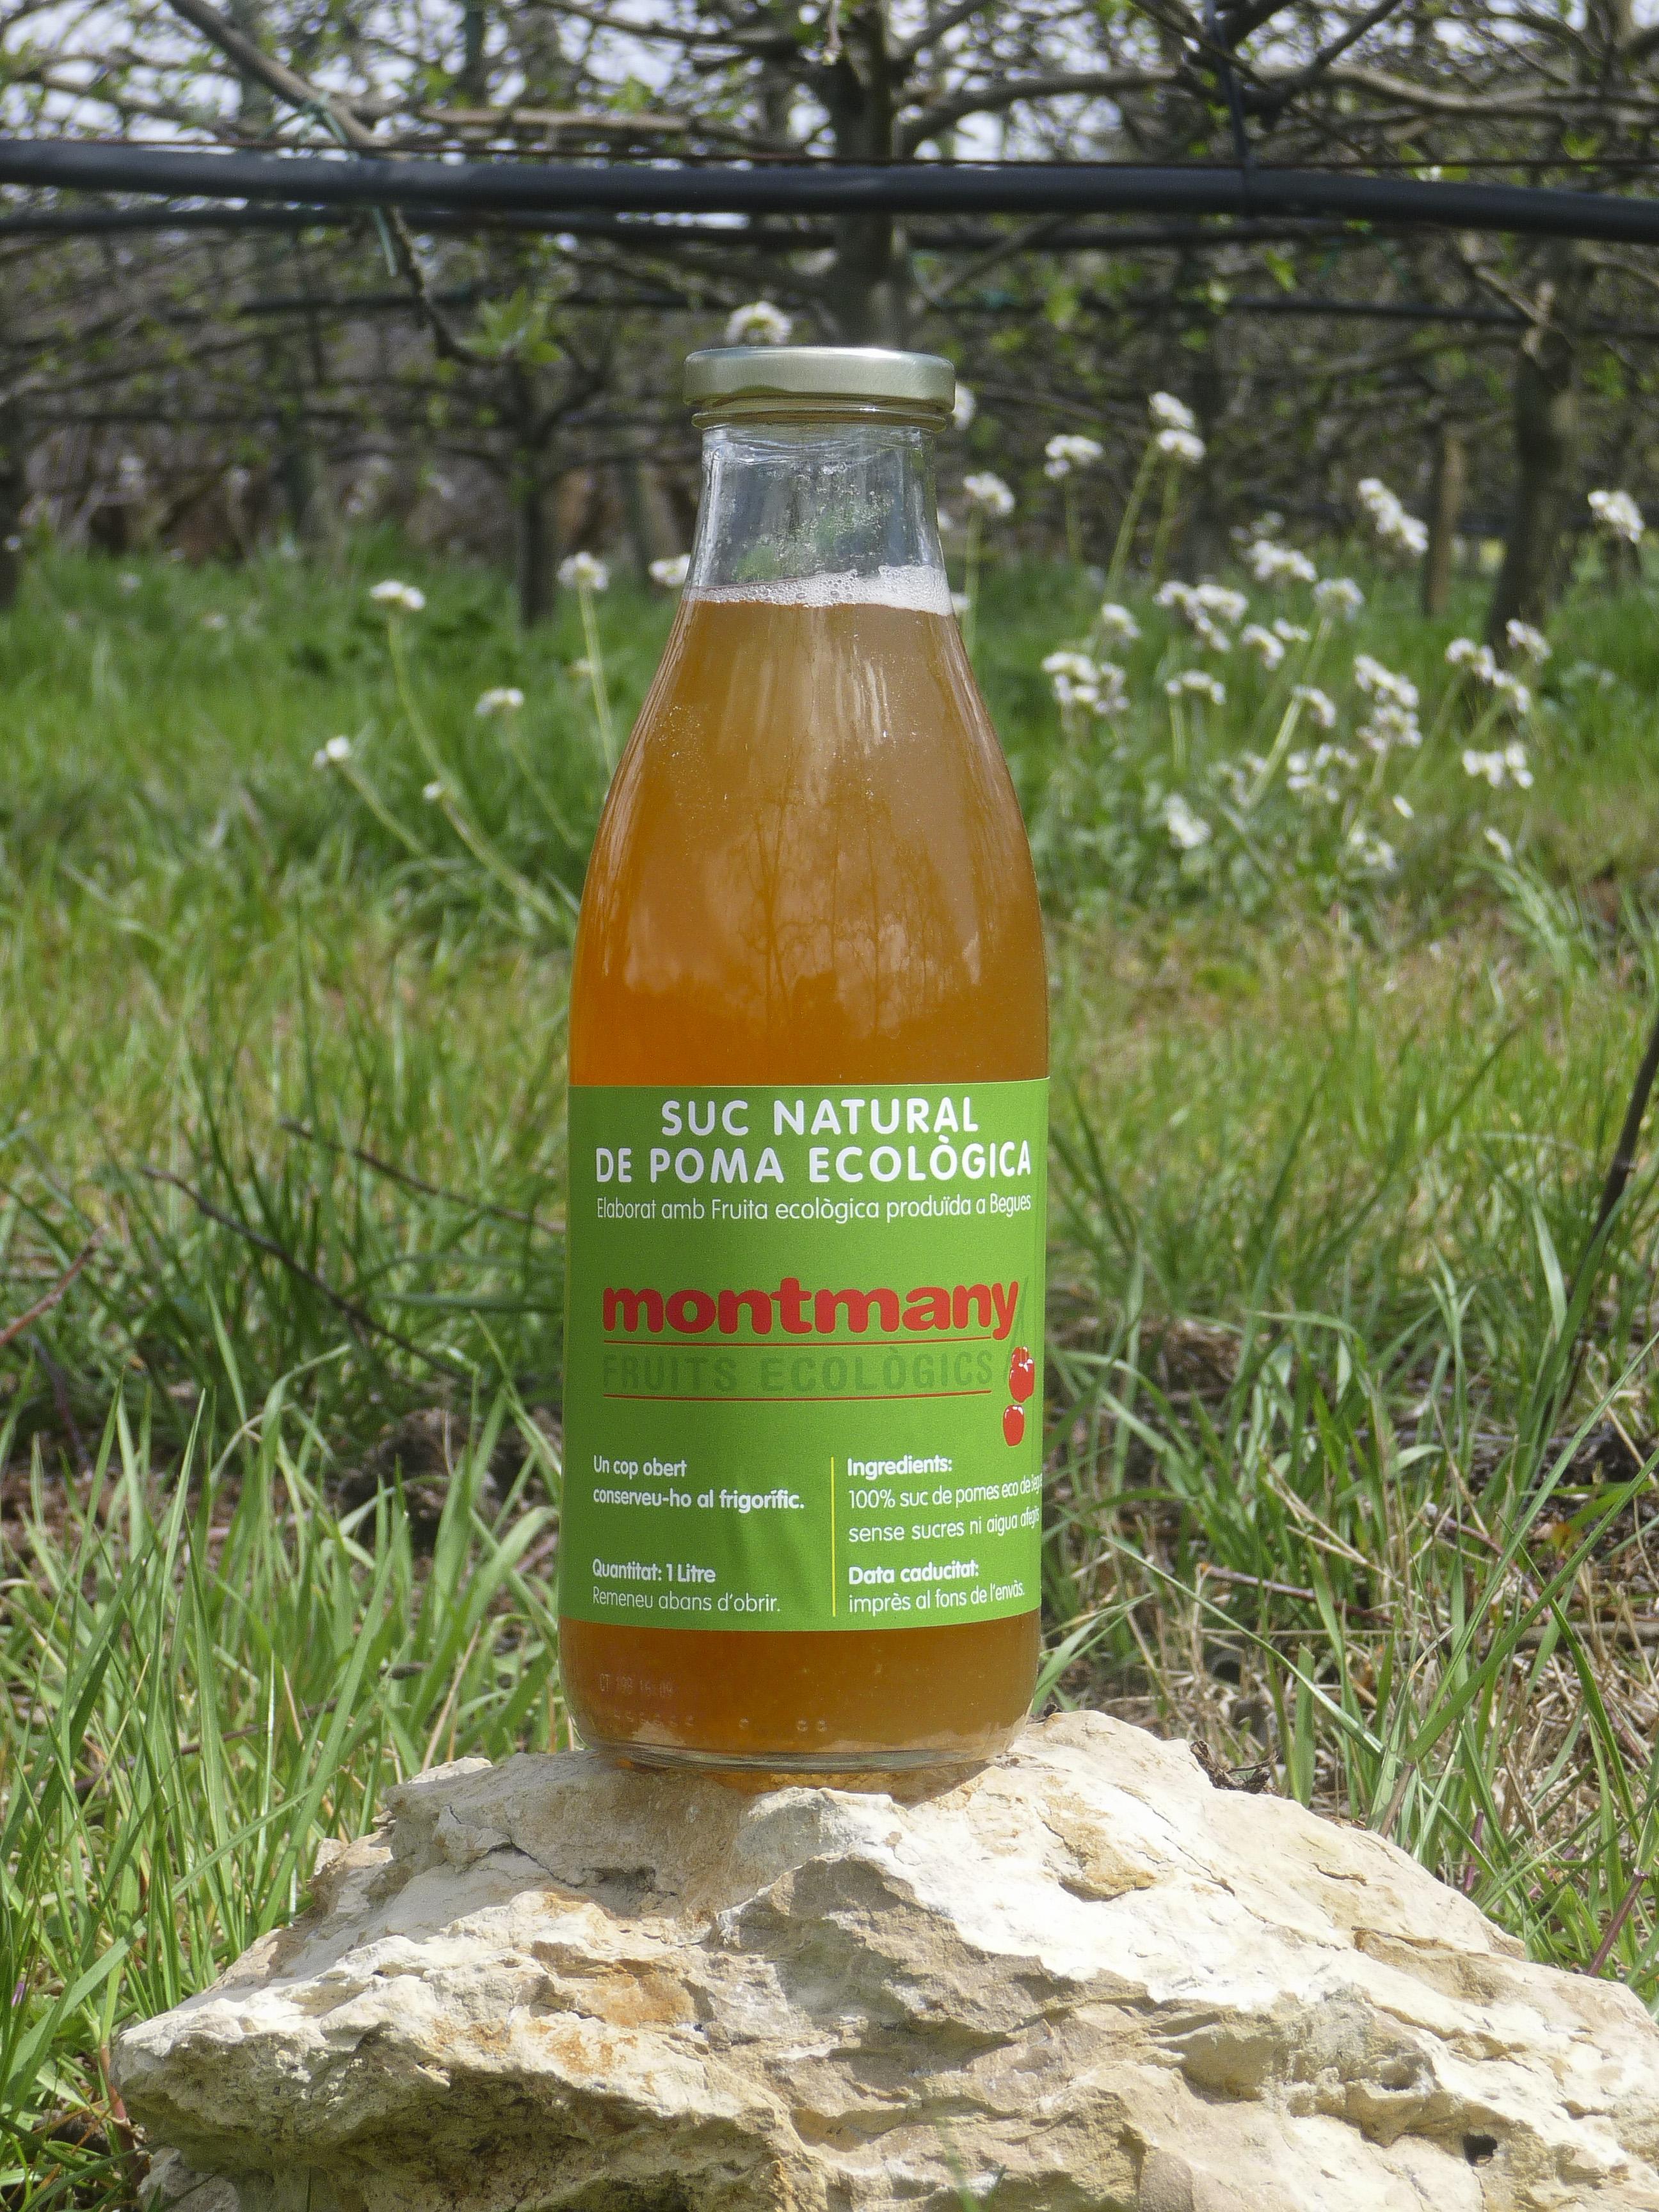 fruitsmontmany05